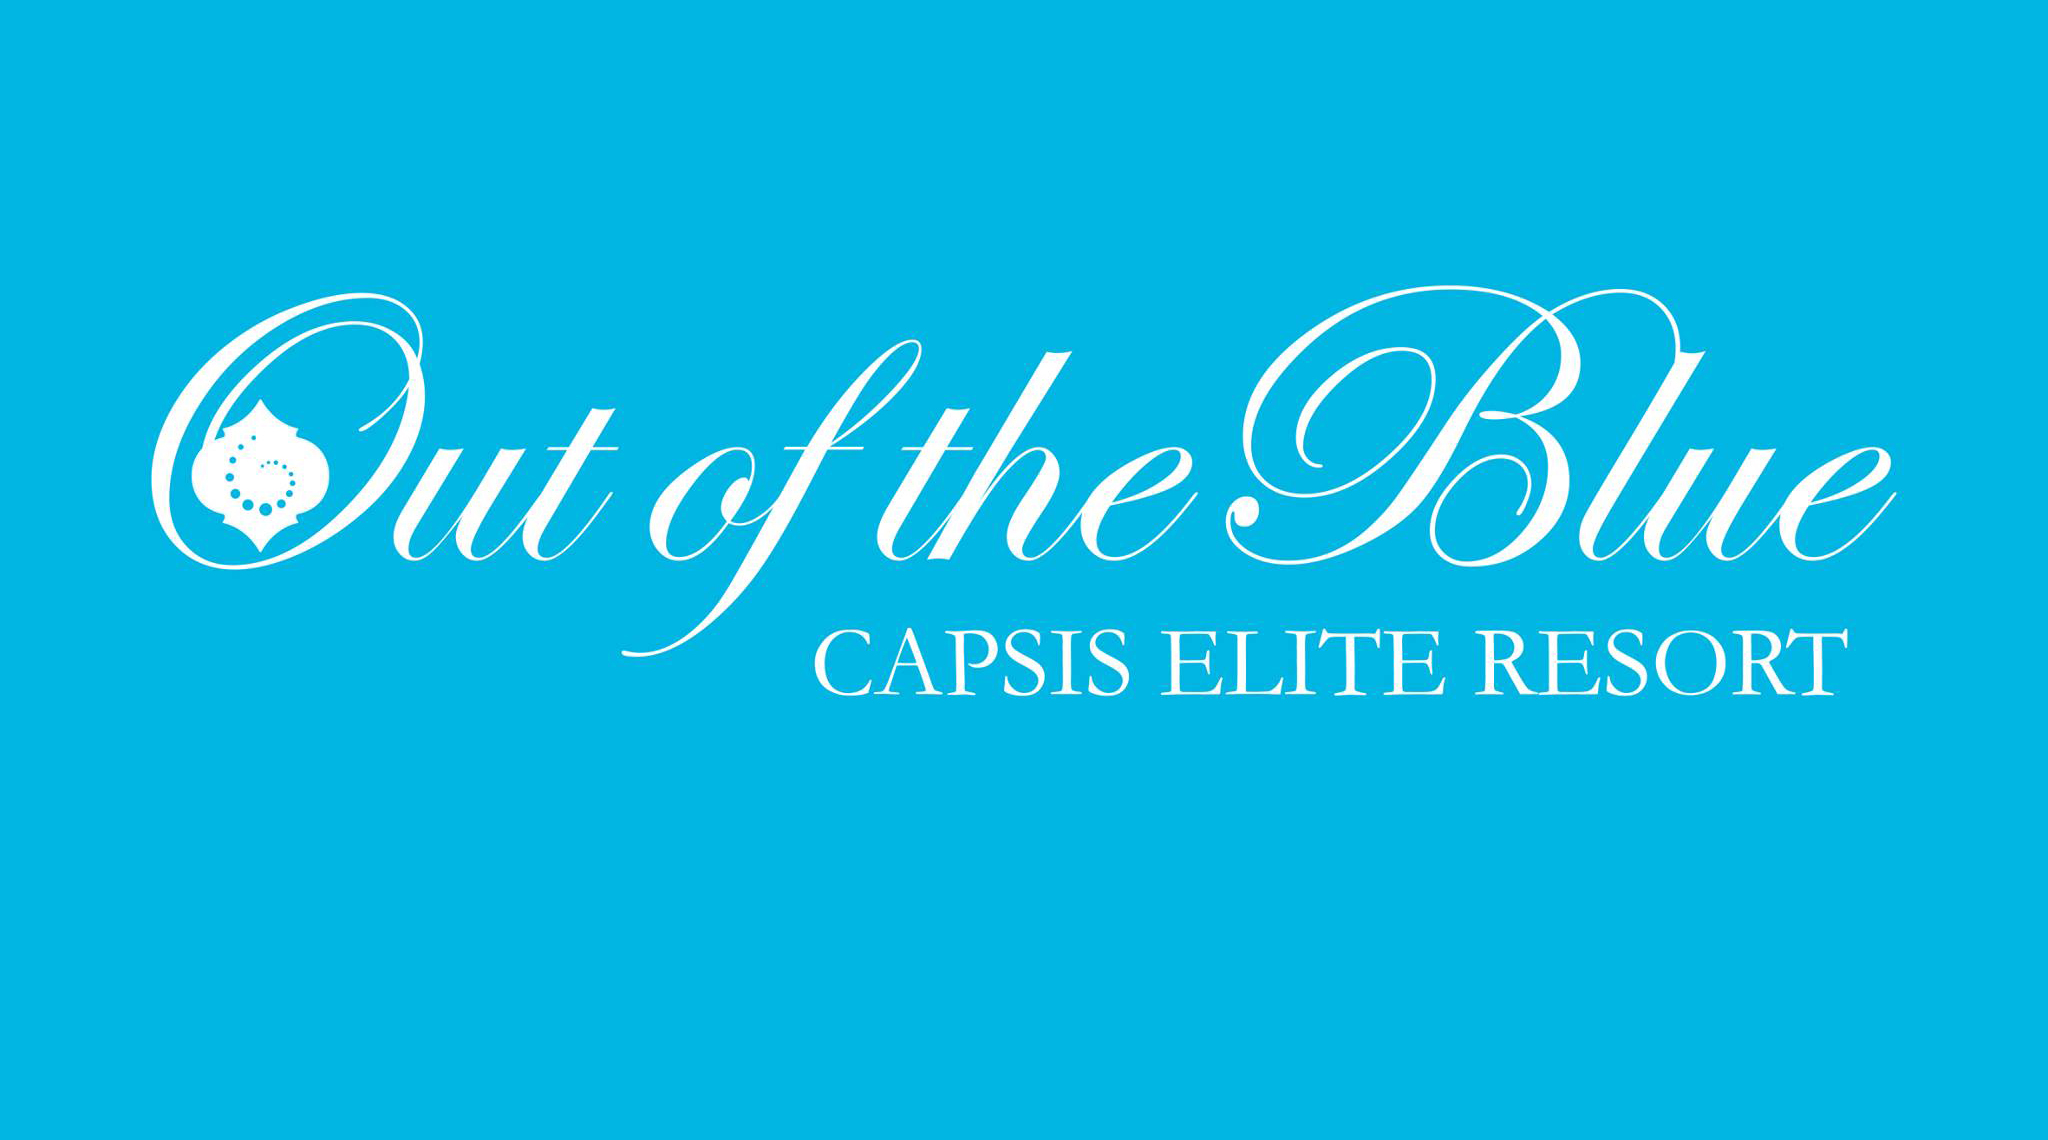 Capsis Elite Resort: «Νέα εποχή» για το ιστορικό ξενοδοχείο – Από το «κανόνι» στη Hines